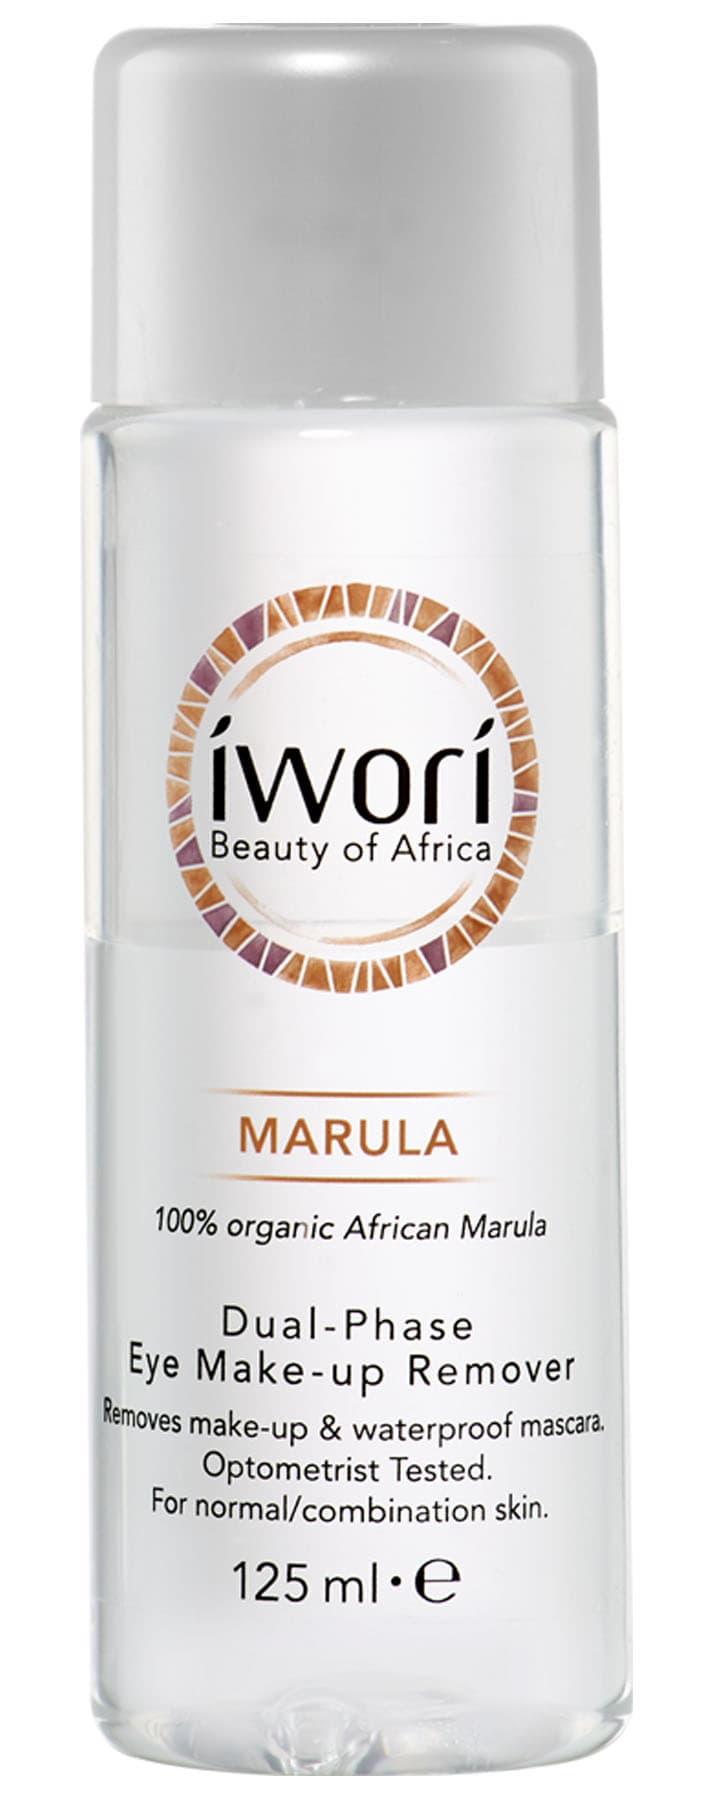 Iwori Marula Dual-Phase Eye Make-Up Remover